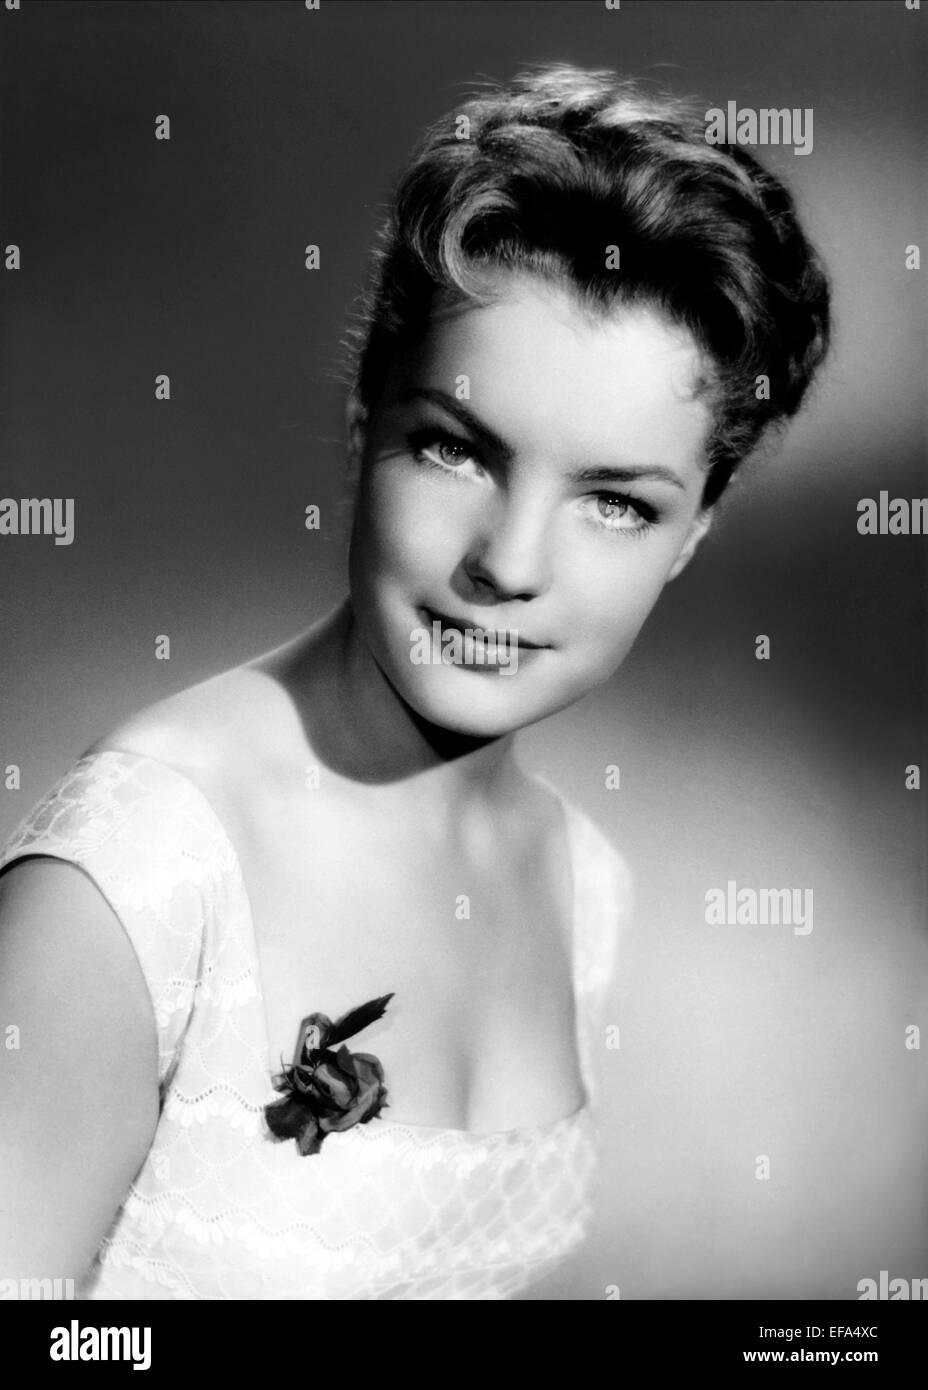 ROMY SCHNEIDER ACTRESS (1956) - Stock Image